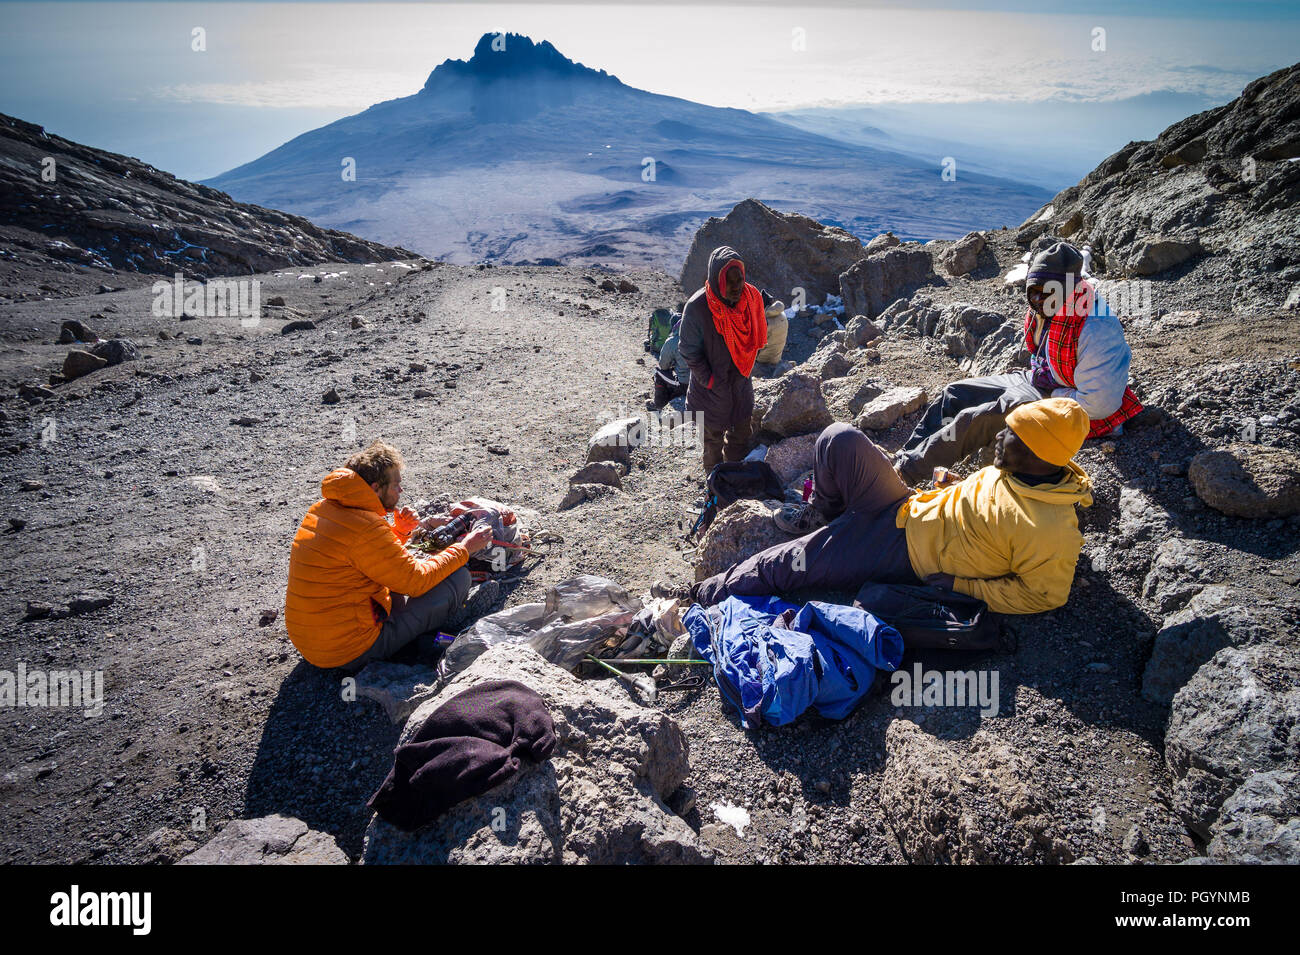 Hikers resting after leaving Uhuru peak summit of Kibo, Mount Kilimanjaro, Kilimanjaro Region, Tanzania. - Stock Image